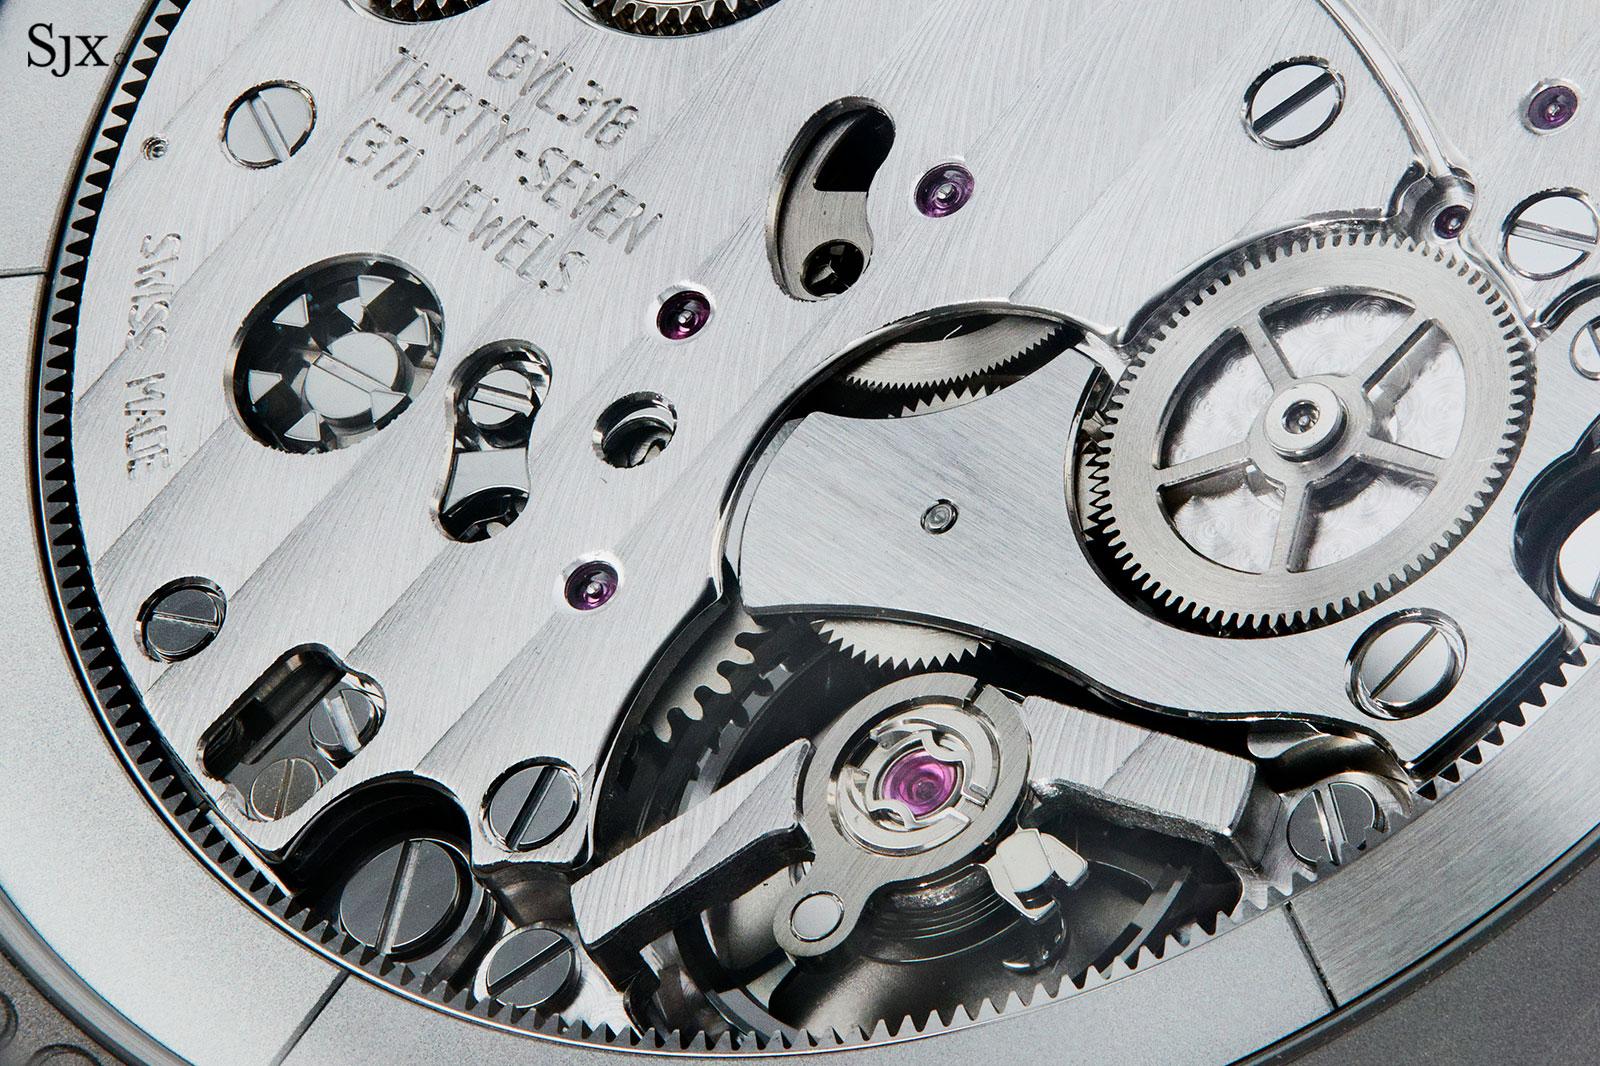 Bulgari Octo Finissimo Chronograph GMT Automatic 6